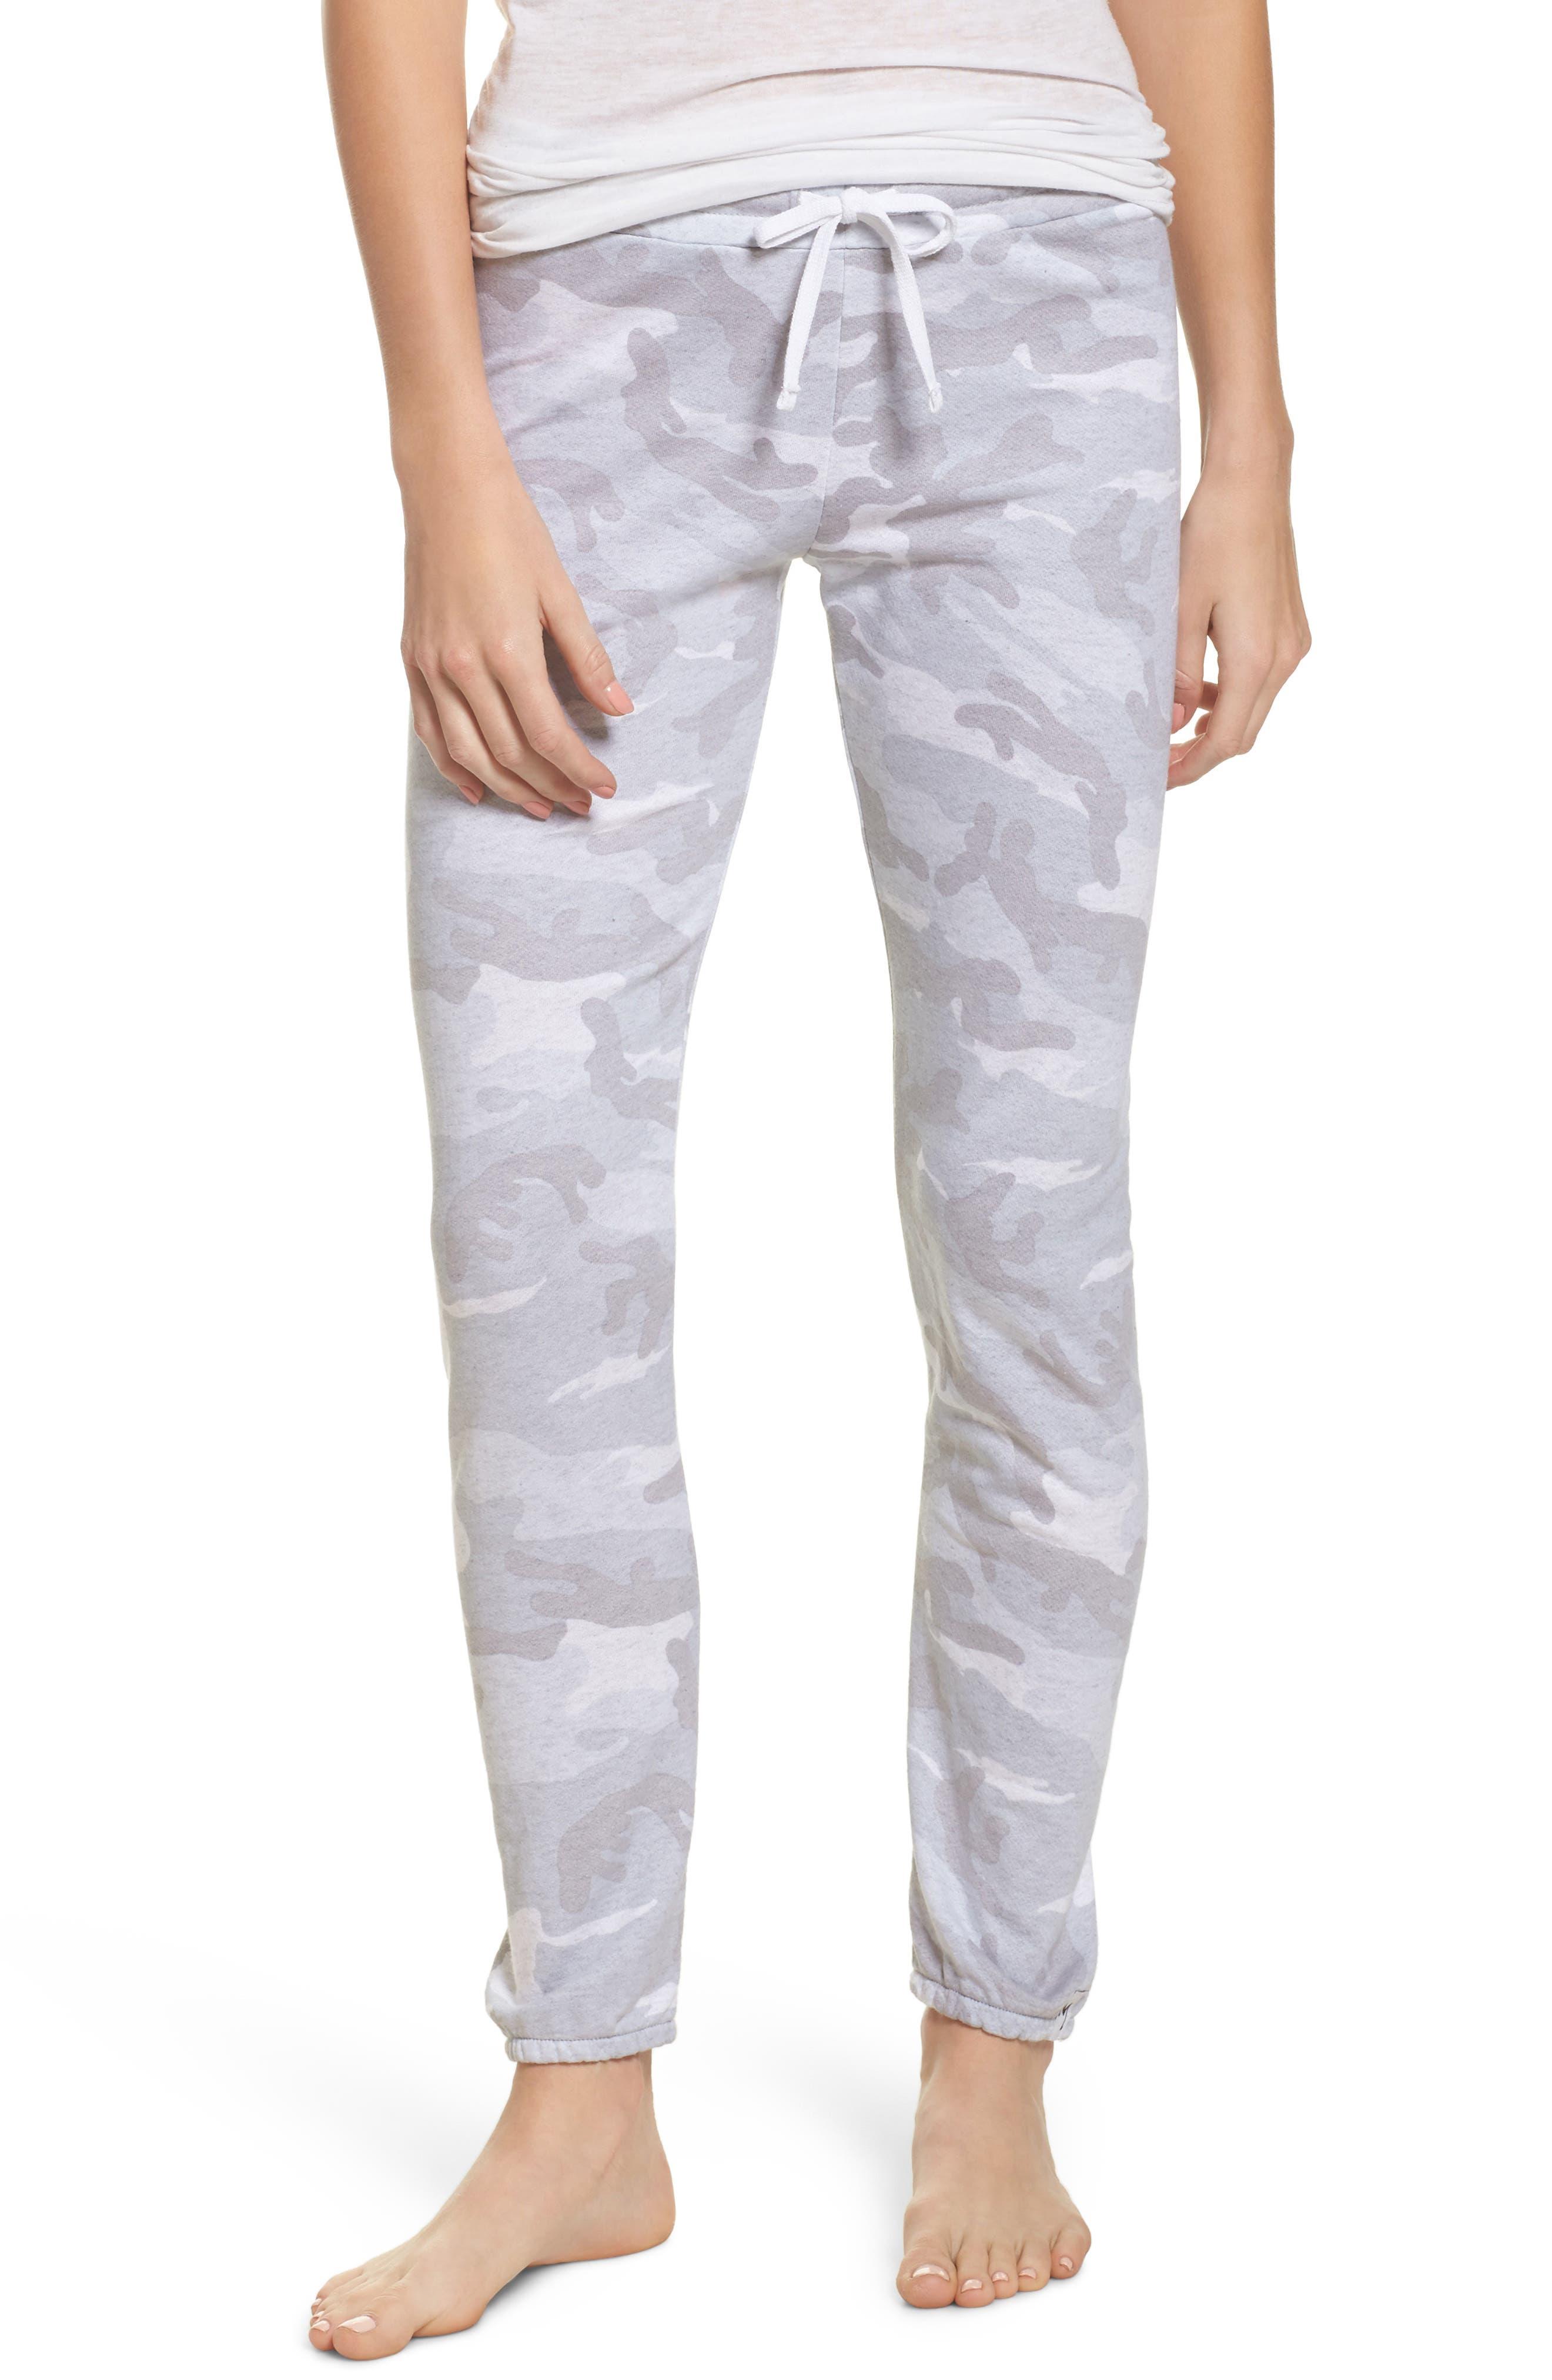 Campbell Vintage Jogger Pants,                         Main,                         color, Light Grey Camo